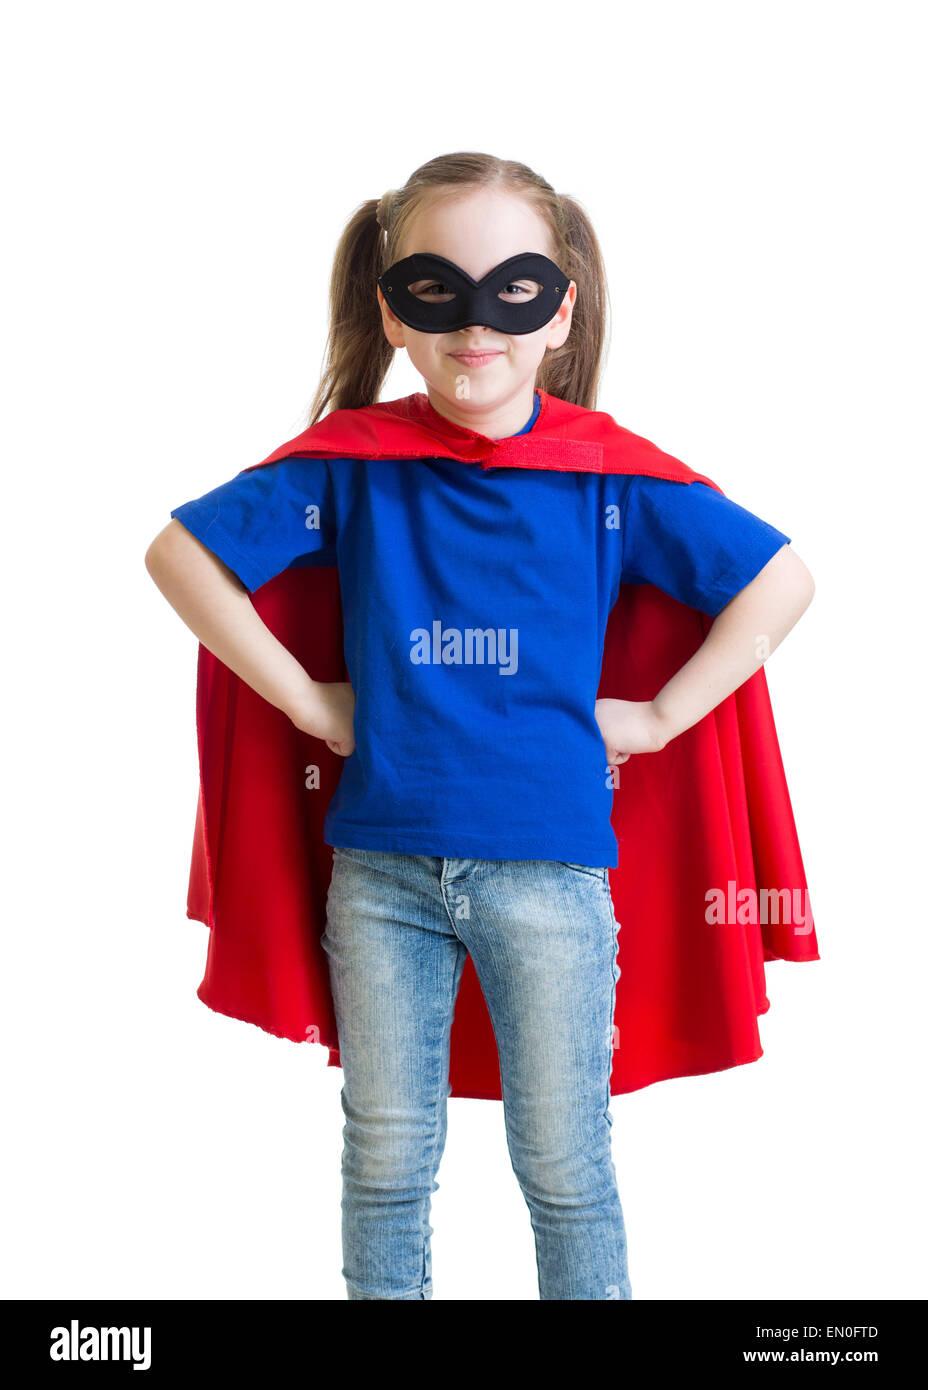 Child girl pretending to be a superhero - Stock Image